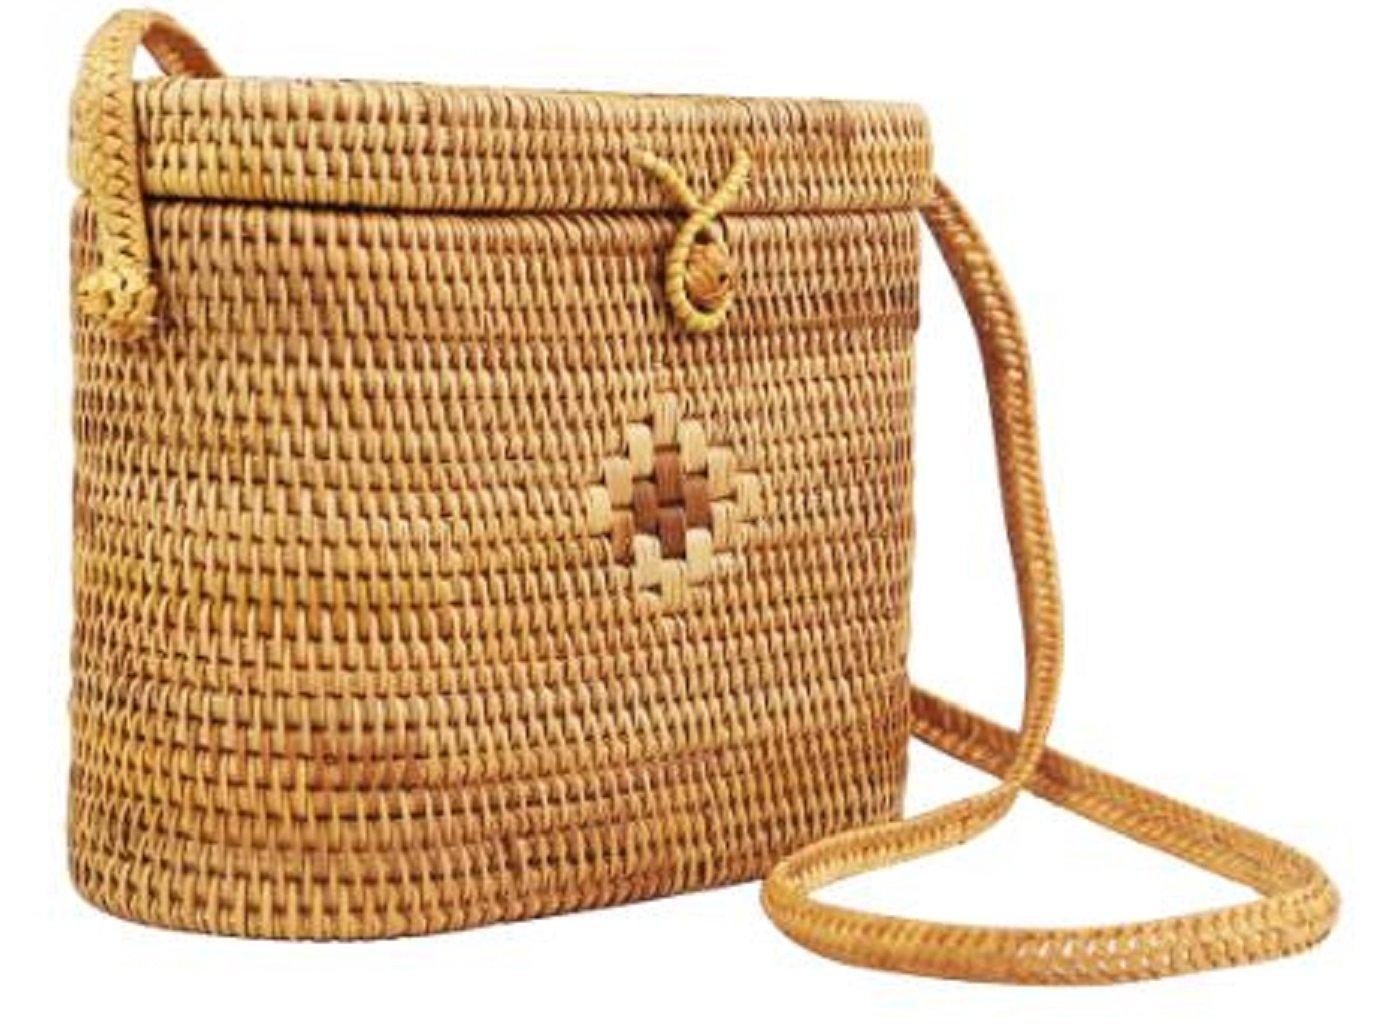 ccc180edf5 Lush Leather Lush Handmade Woven Round Cylinder Handwoven Pattern Weave  Designs Rattan Straw Wicker Basket Shoulder Bag  Amazon.in  Home   Kitchen